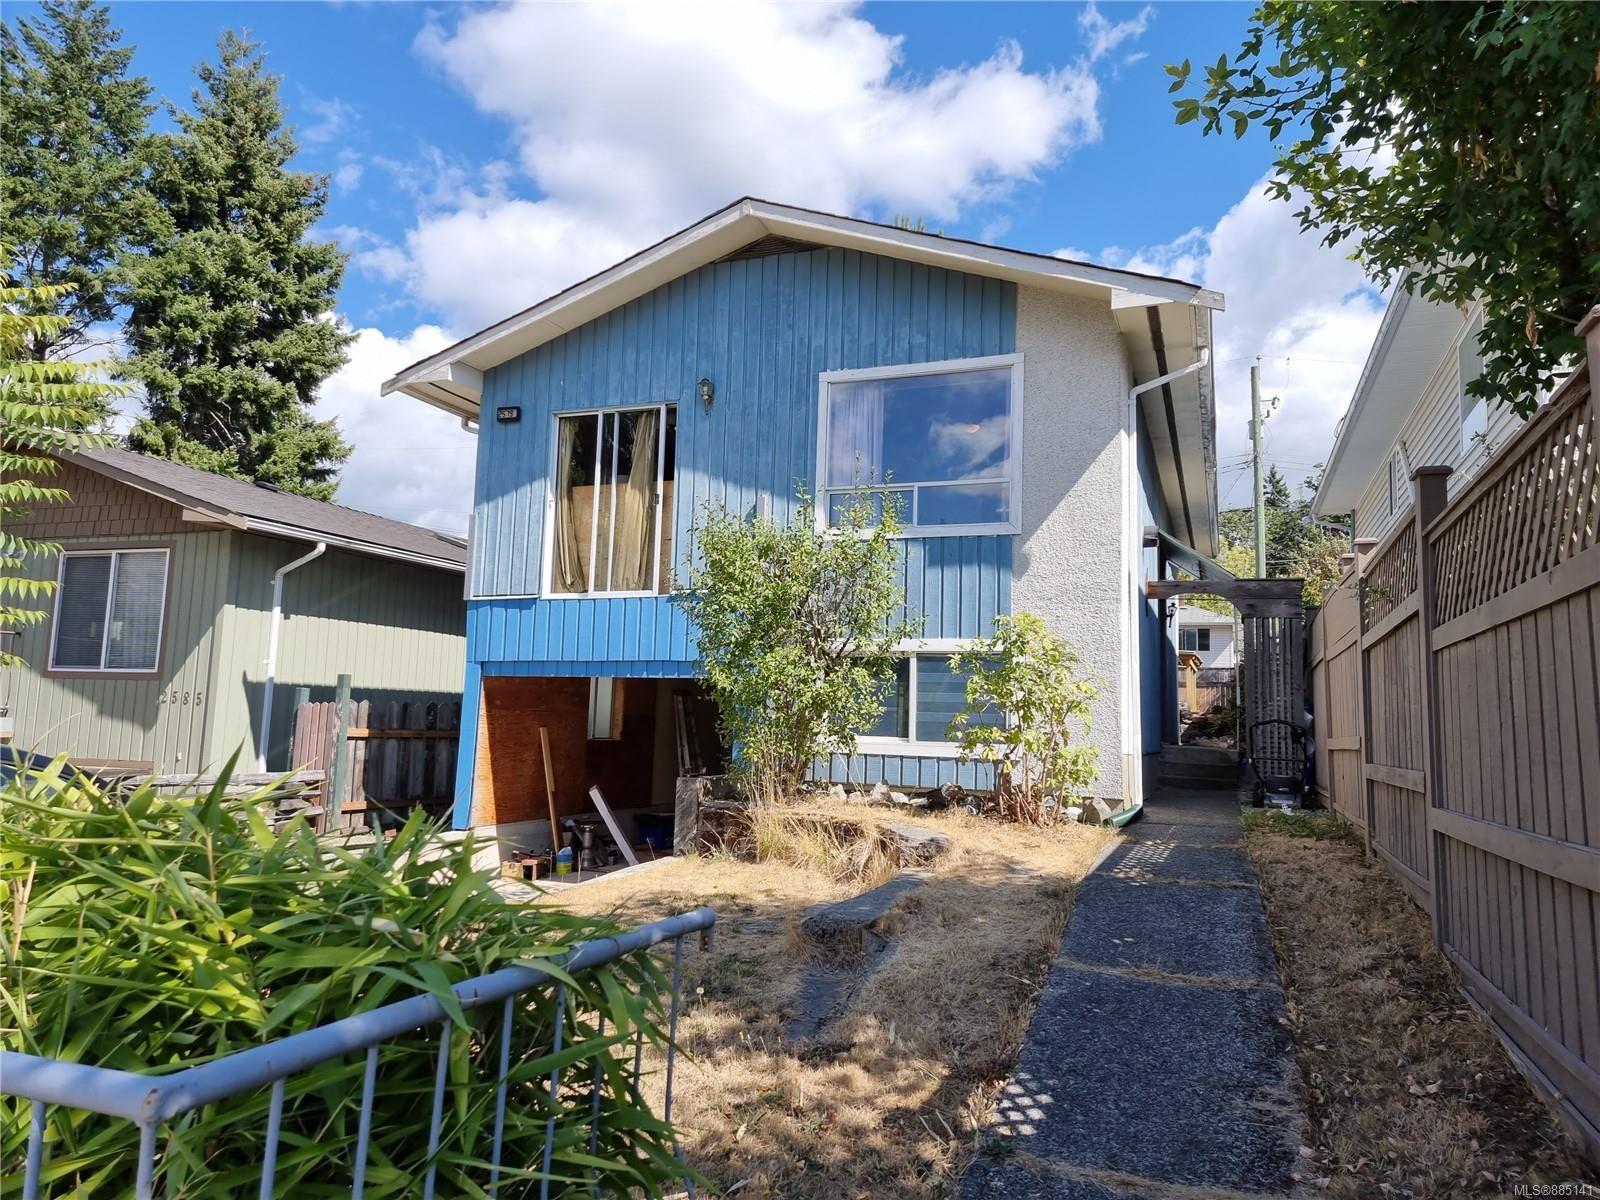 Main Photo: 2579 2nd Ave in : PA Port Alberni House for sale (Port Alberni)  : MLS®# 885141